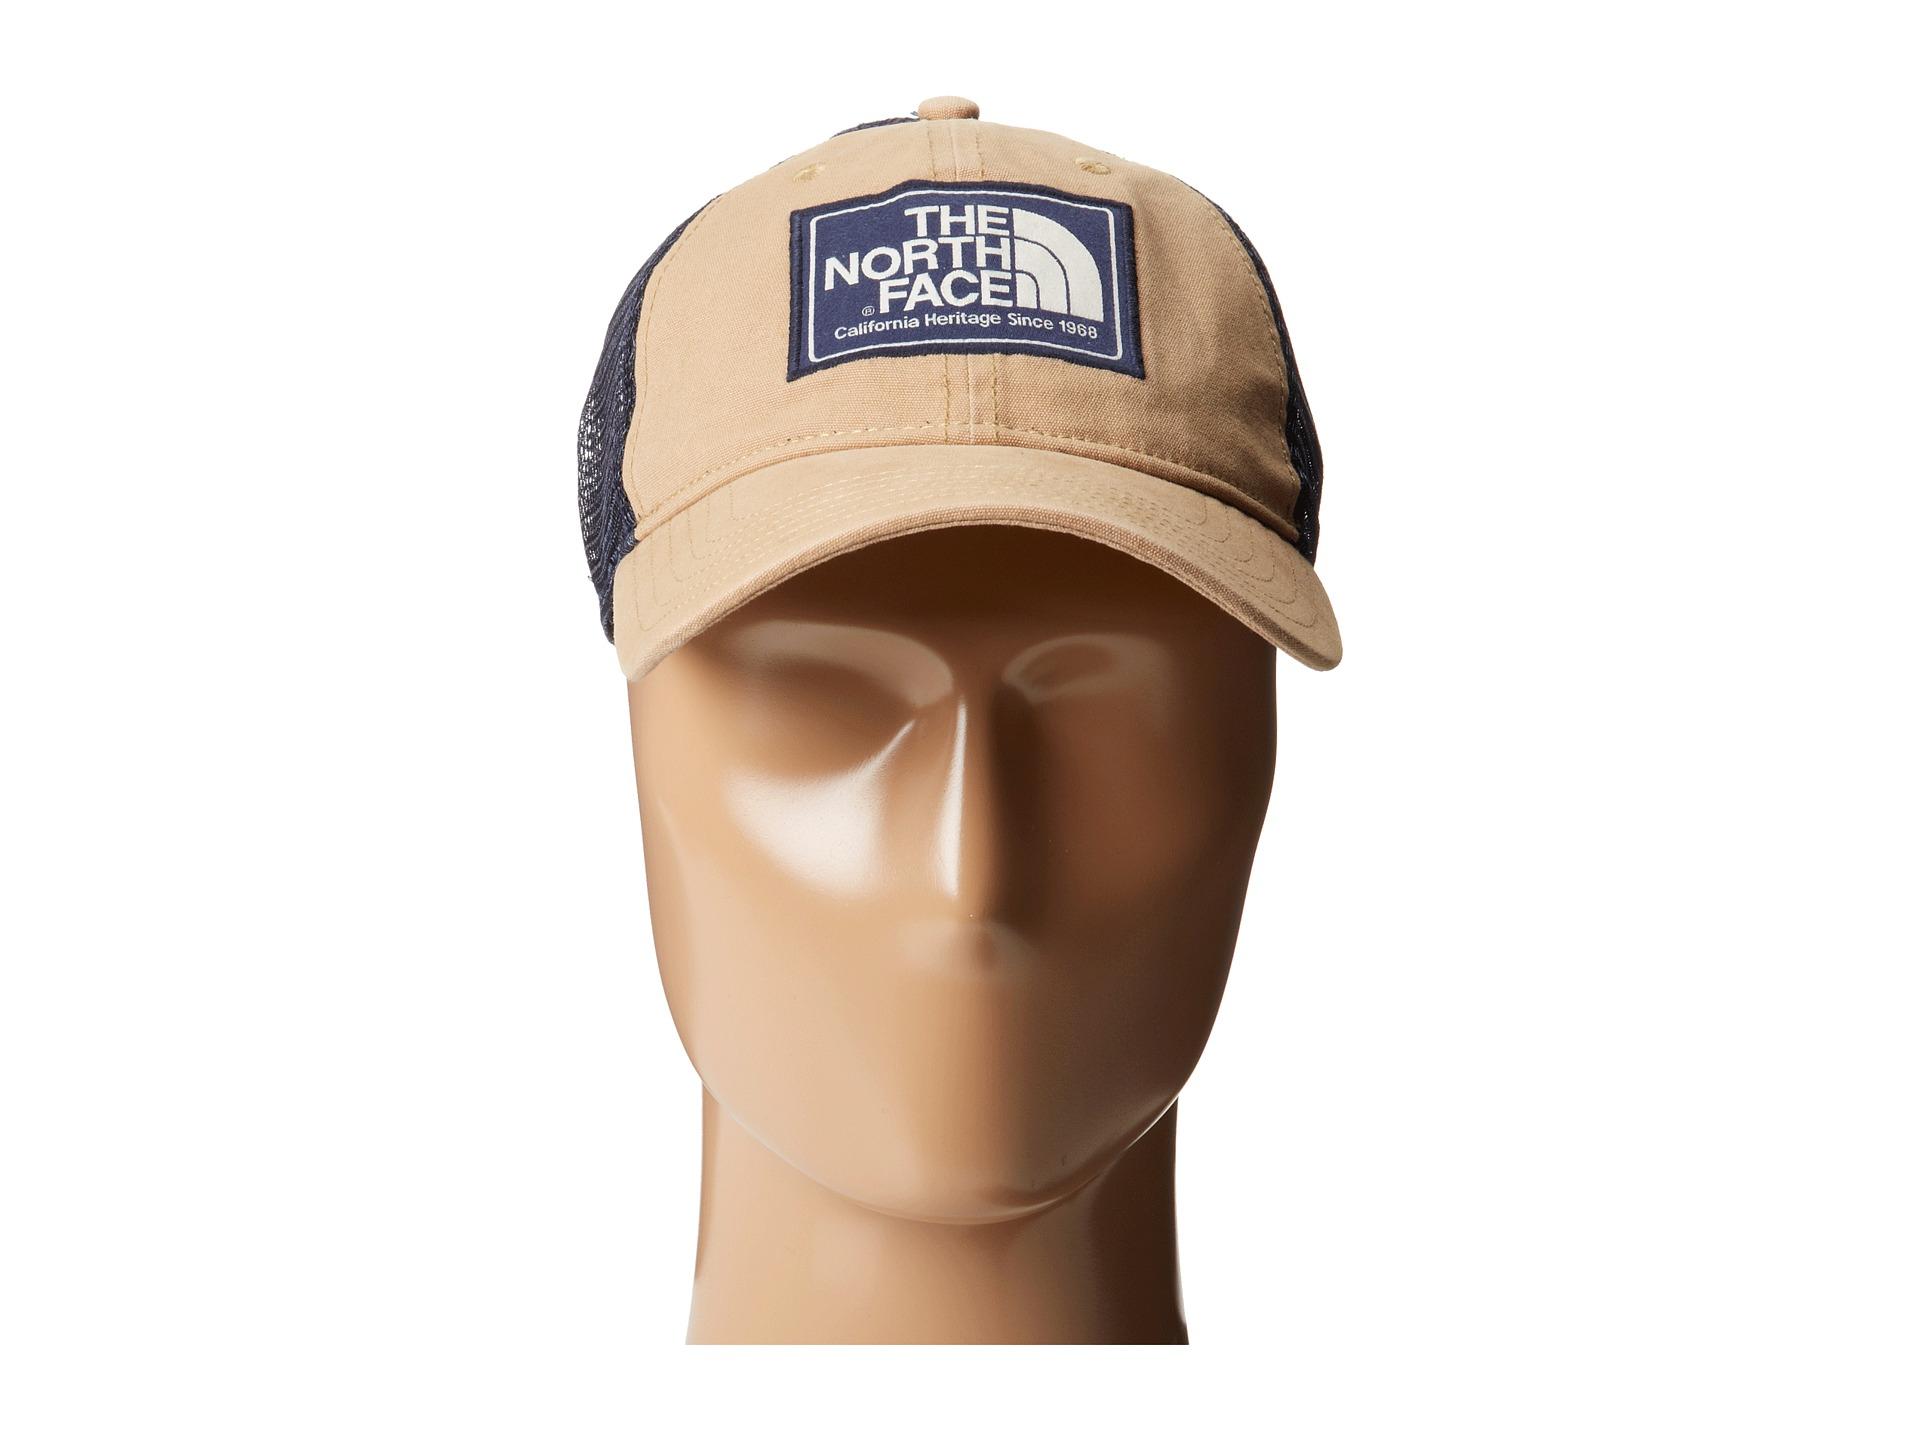 Lyst - The North Face Mudder Trucker Hat in Natural 7a5df53729da